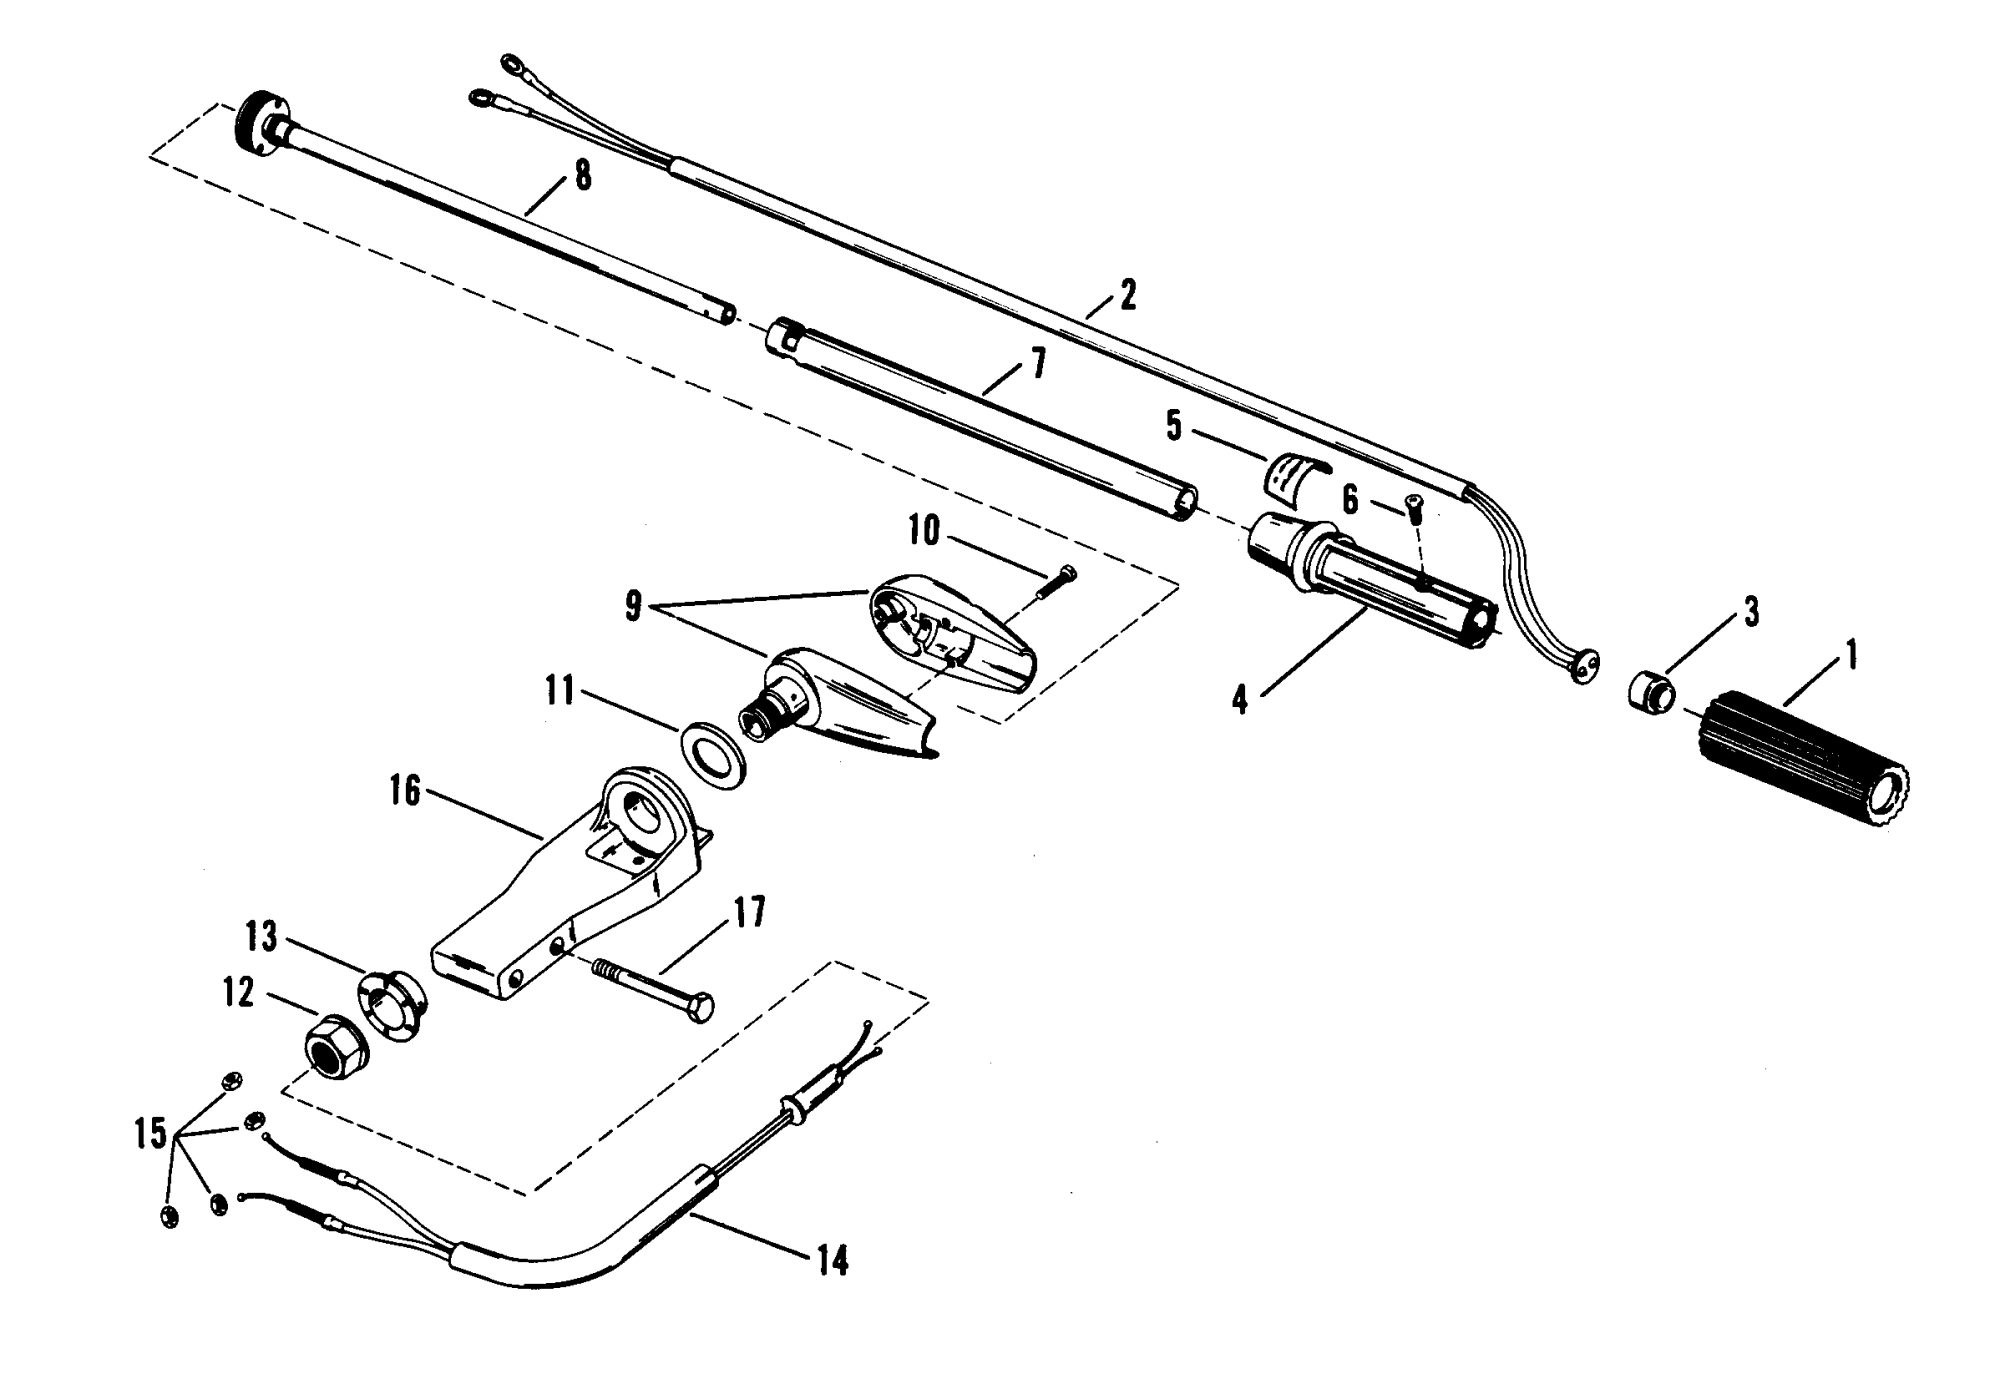 hight resolution of mercury 25xd wiring diagram wiring diagram autovehicle mercury 25xd wiring diagram